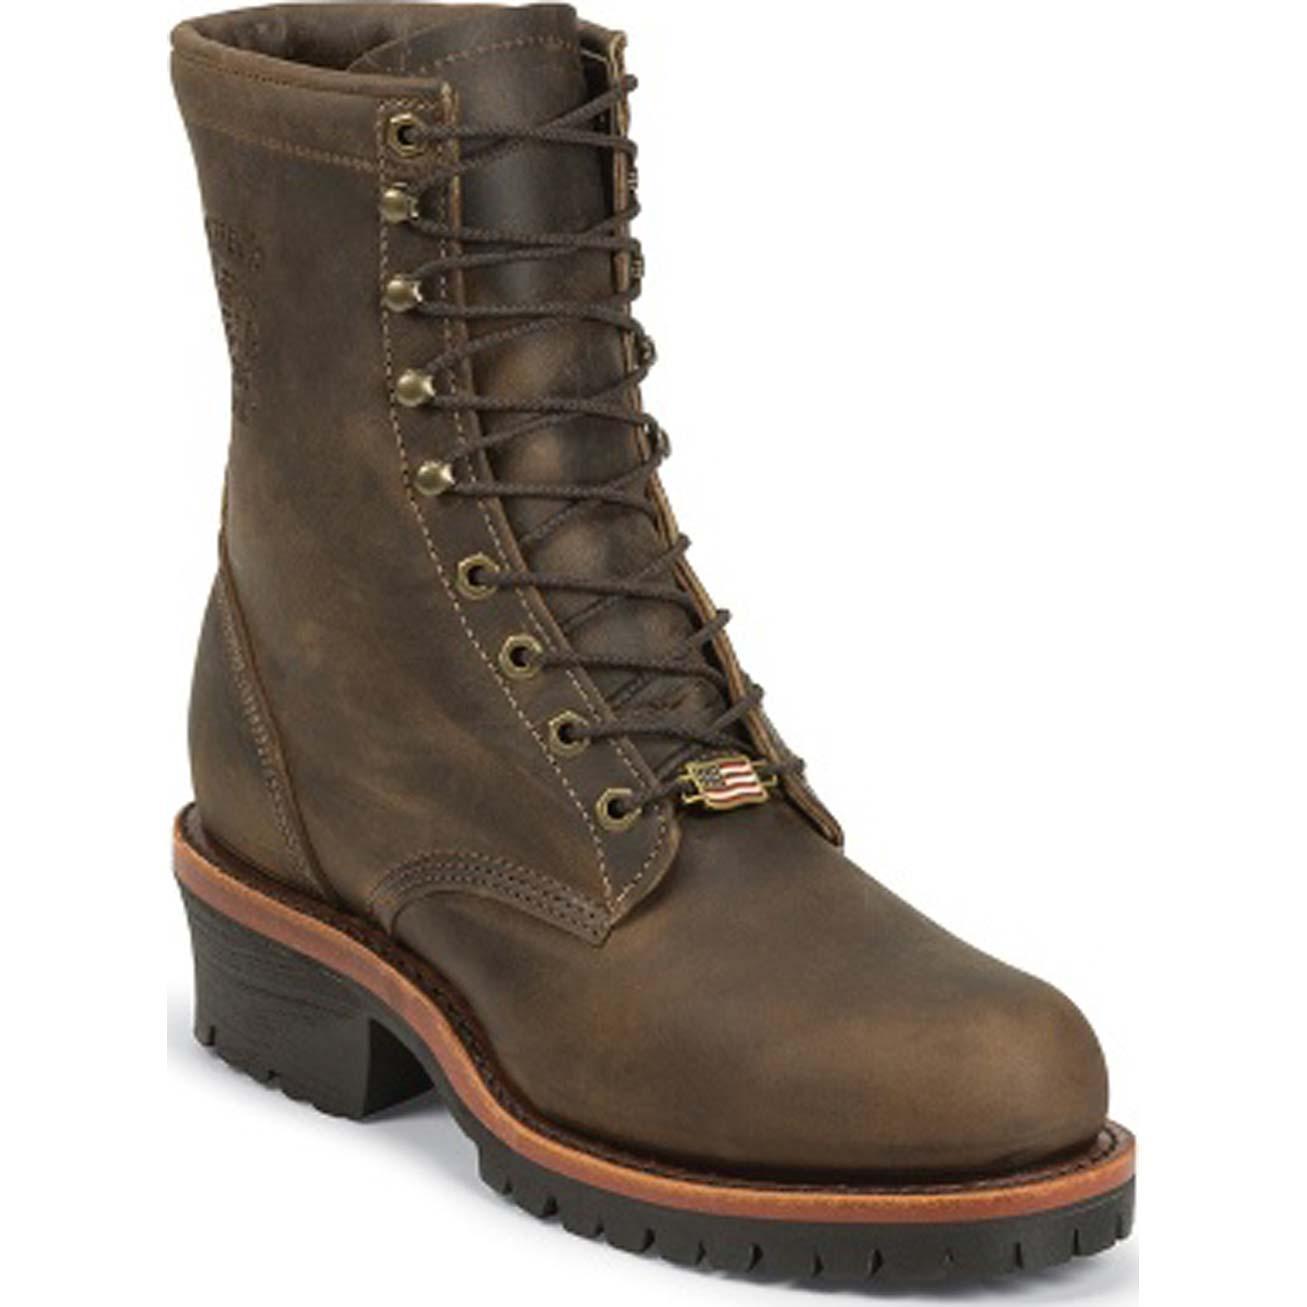 Chippewa Steel Toe Logger Work Boots 20091